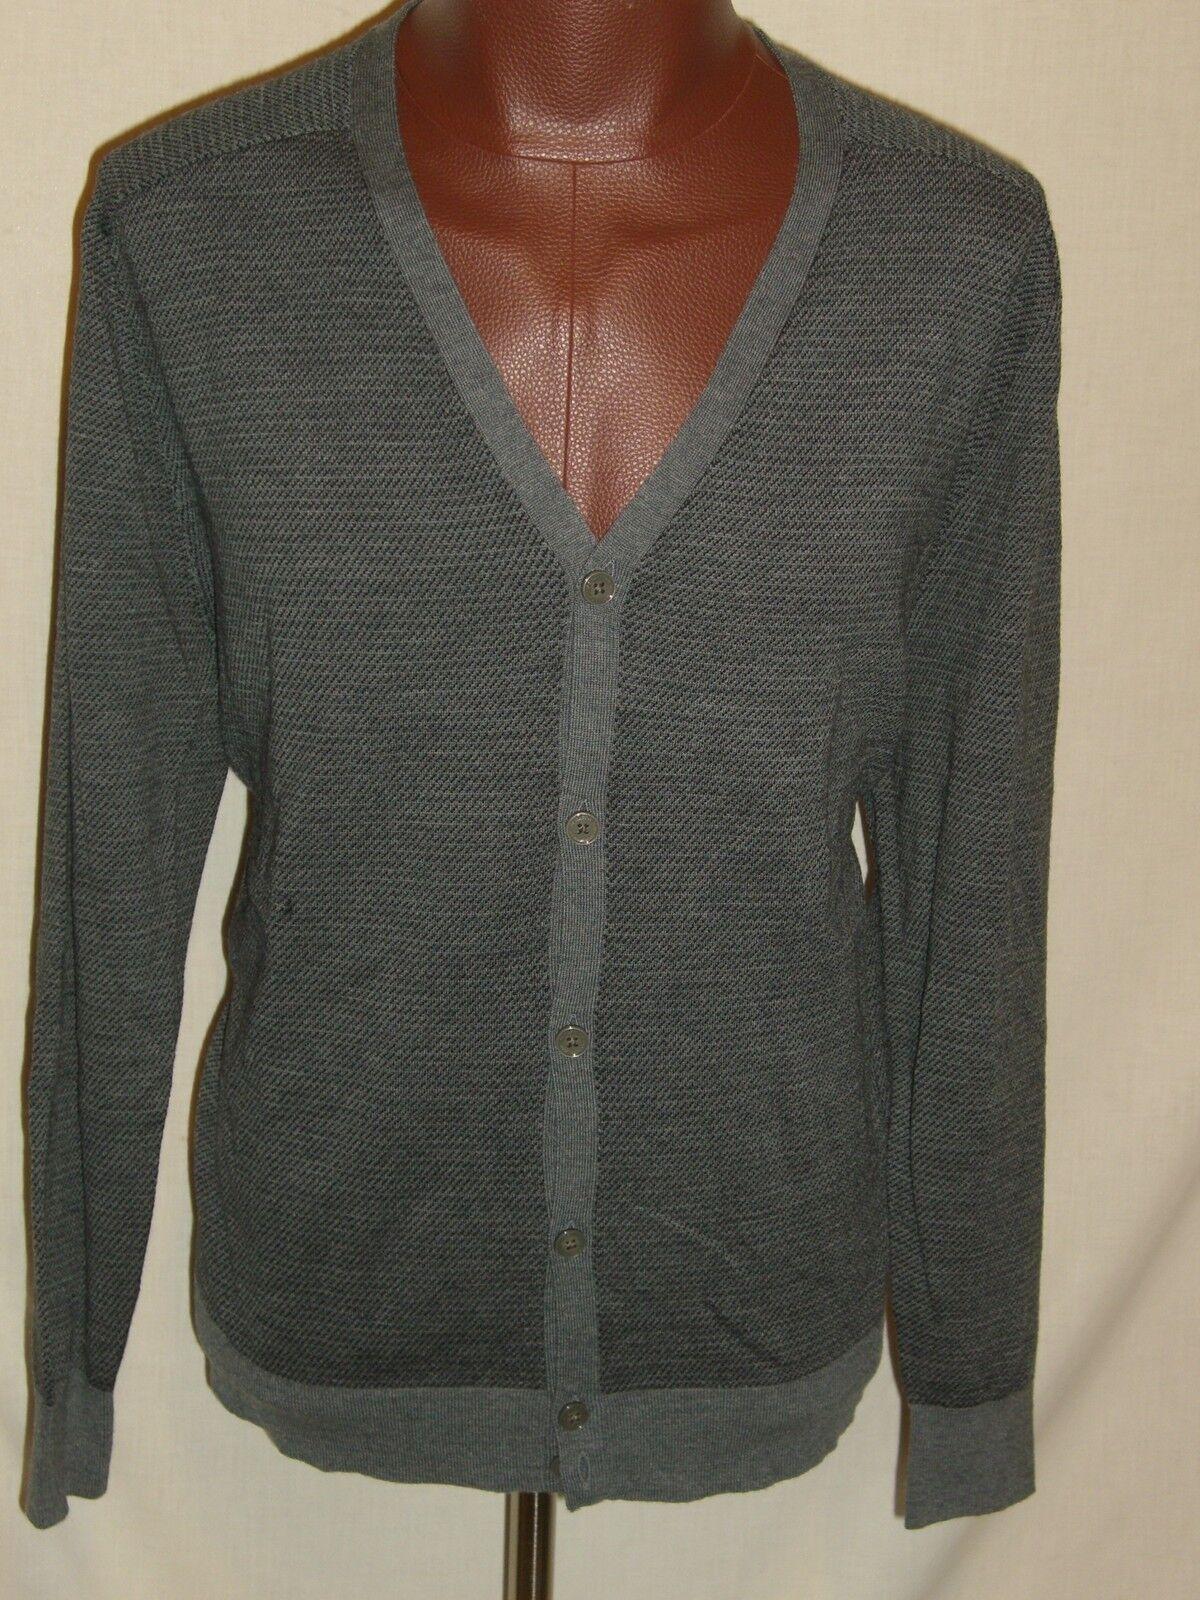 HART SCHAFFNER MARX Dk grau Fine Merino Wool Cardigan Sweater - XL - NWT 150